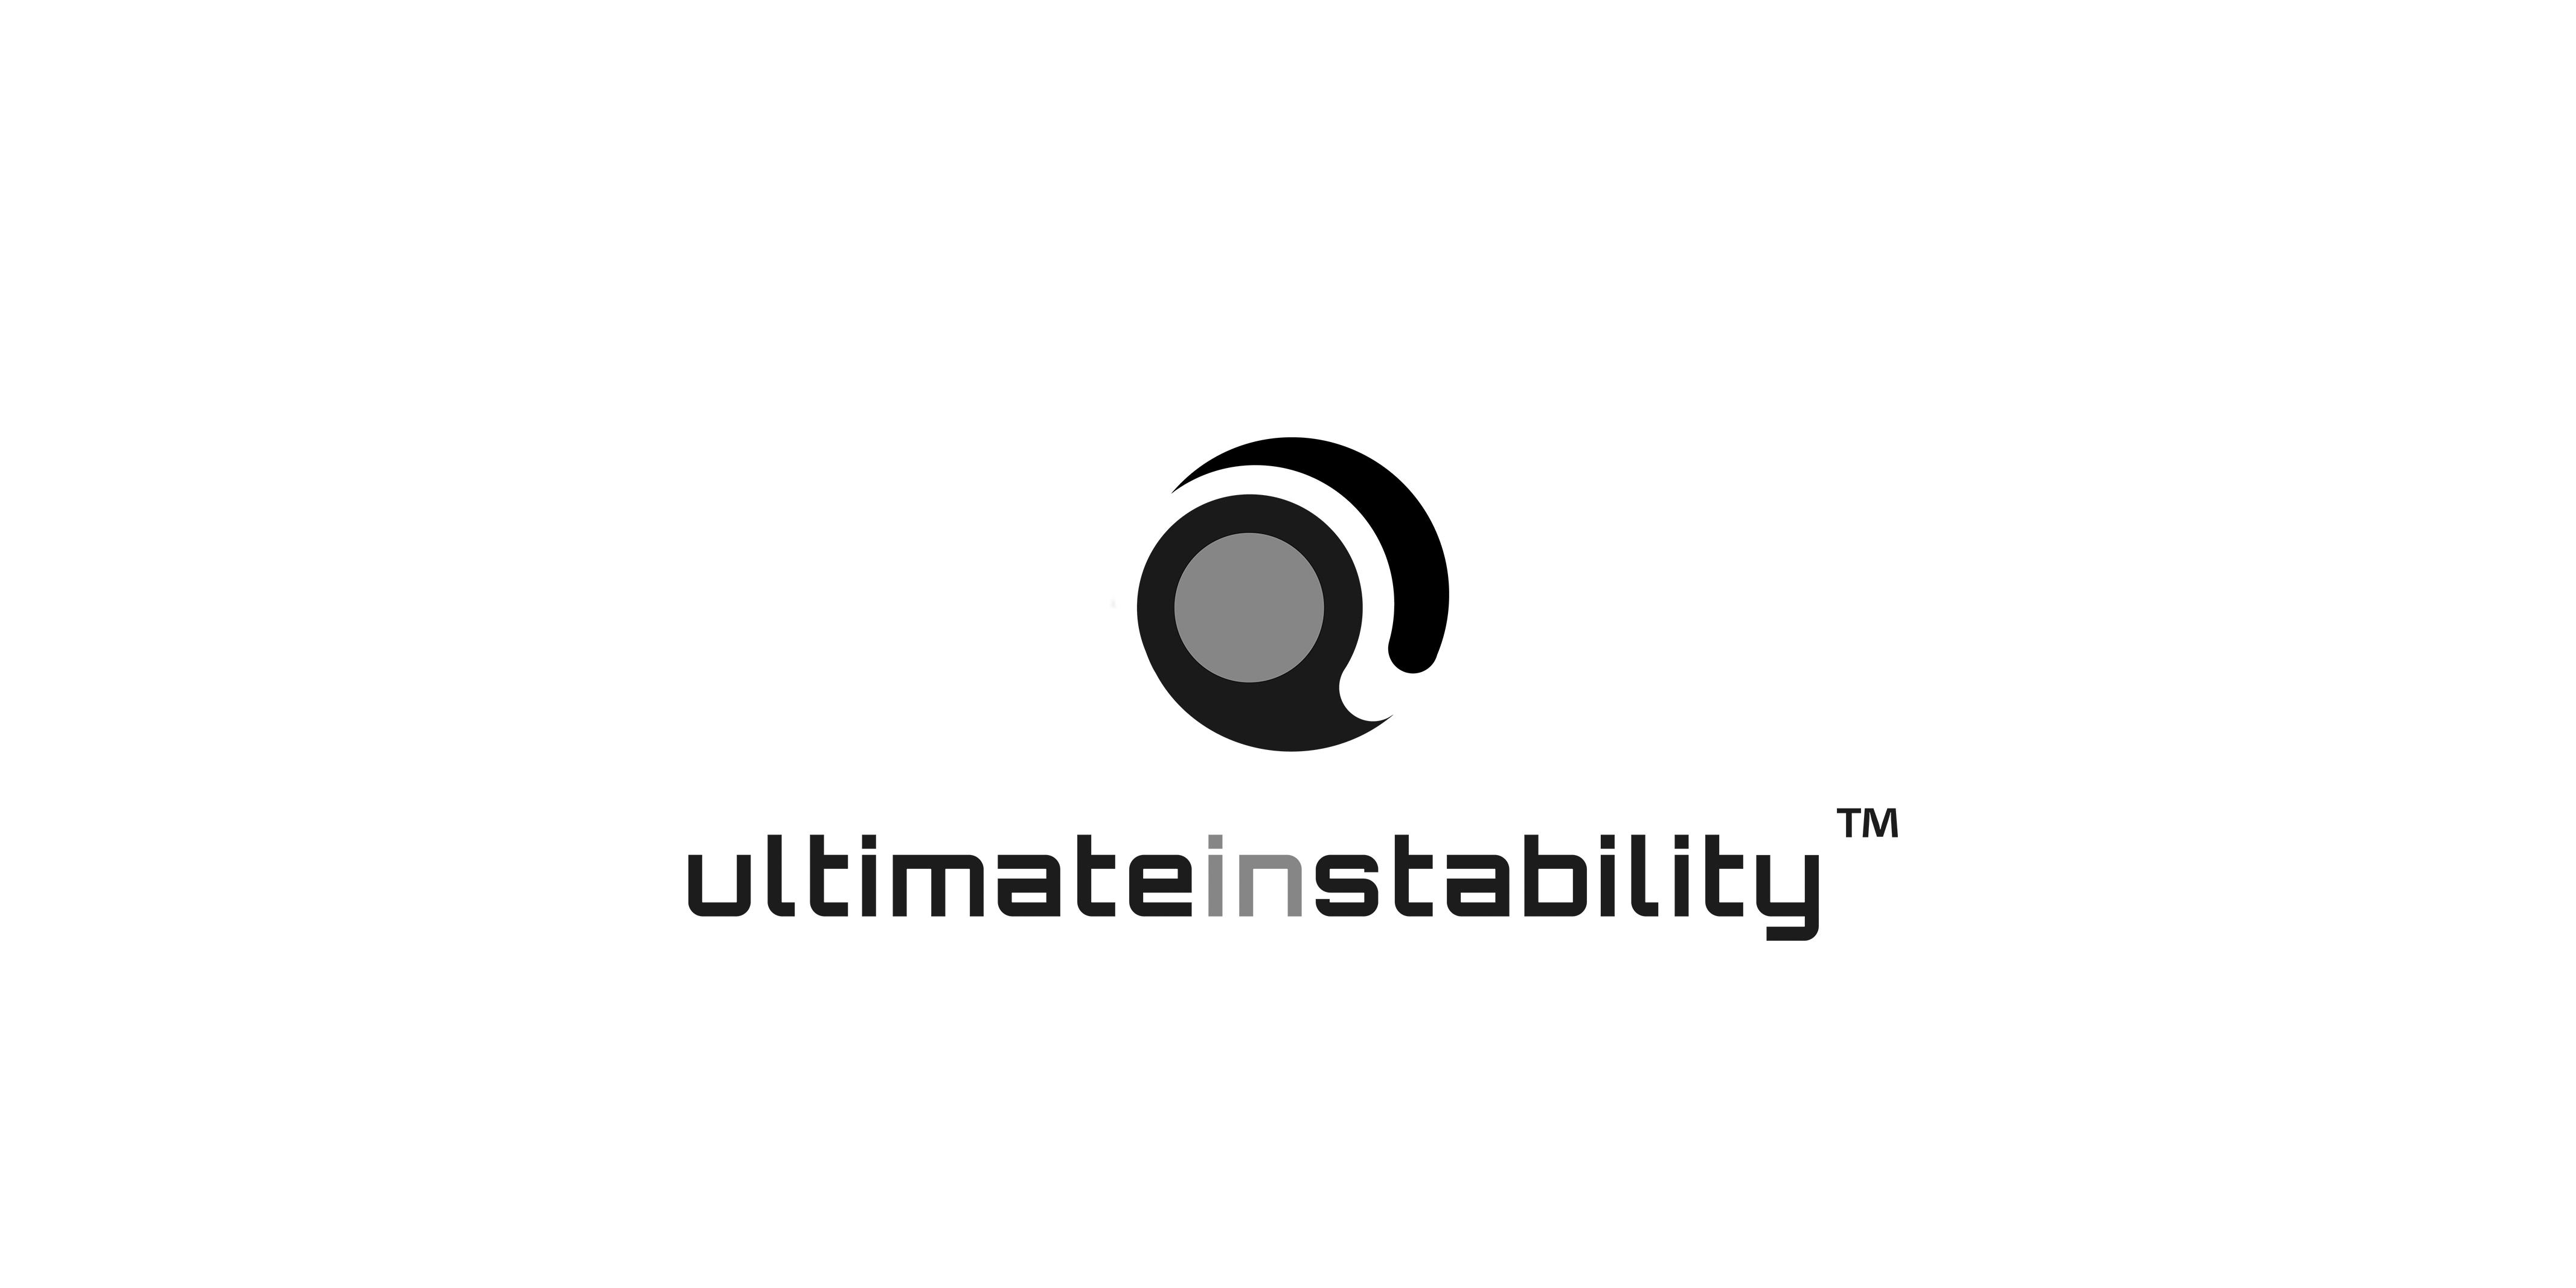 Ultimate Instability logo Fitfair Jaarbeurs